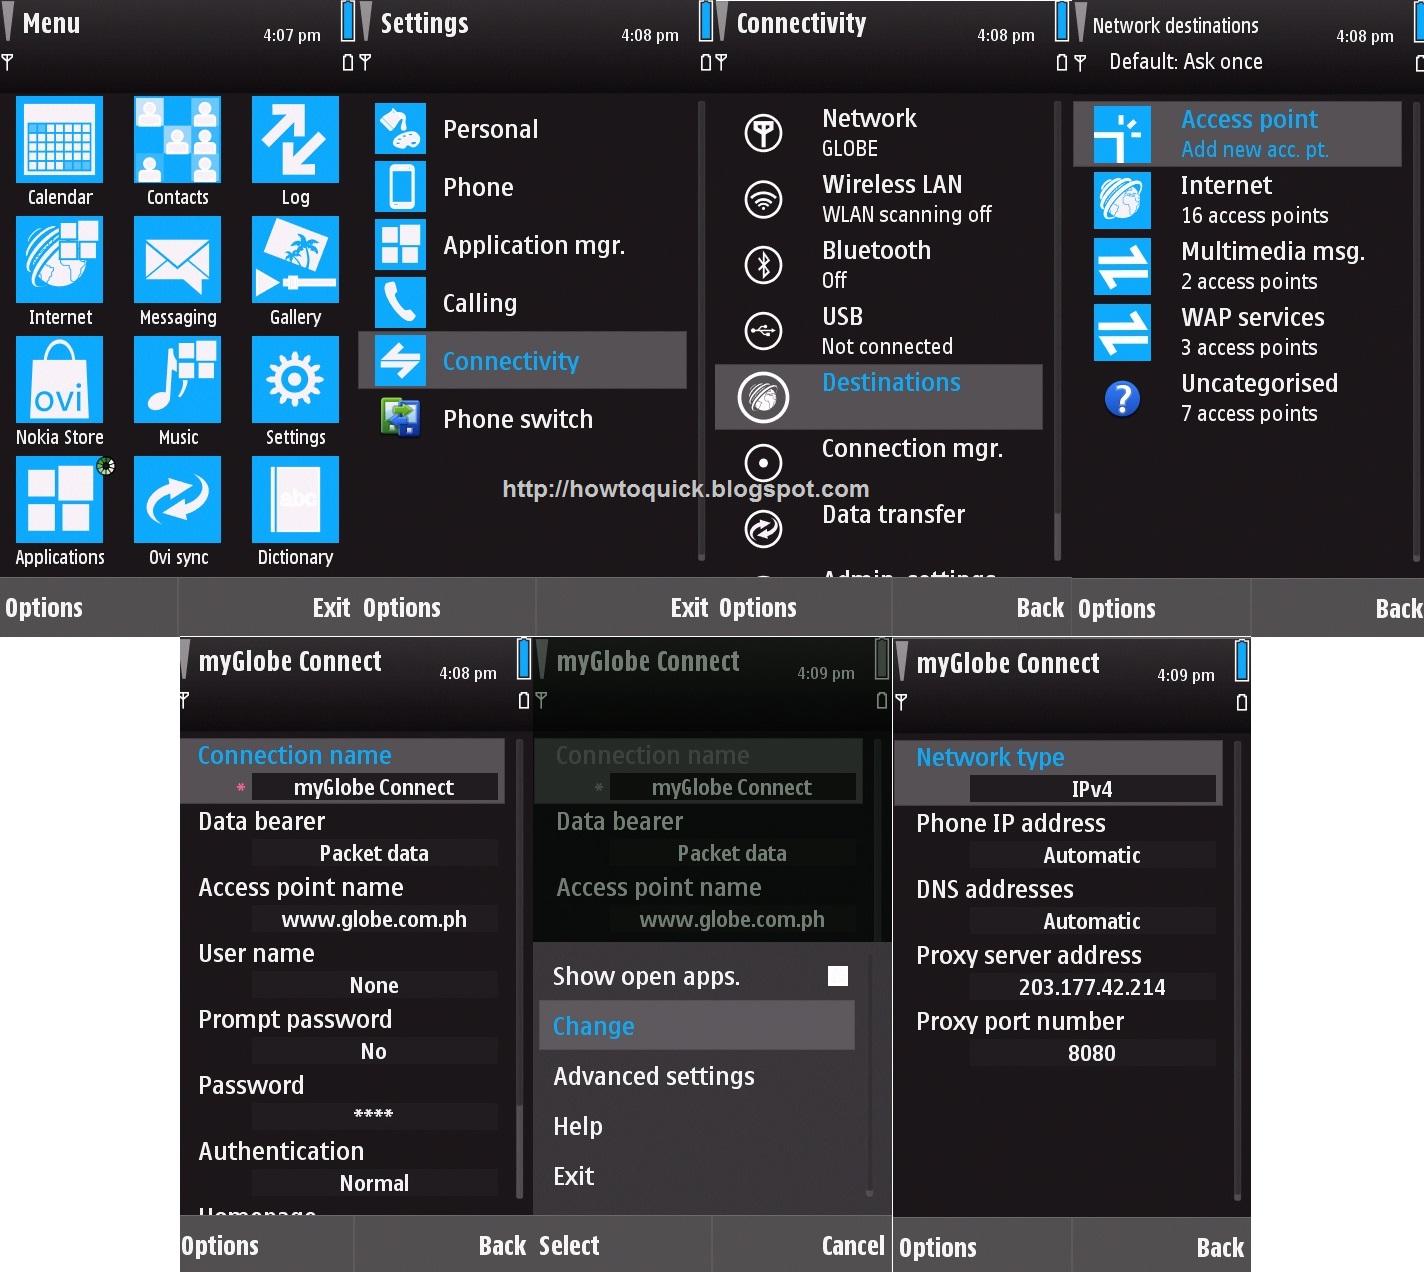 Nokia 5530 , 5800, 5230 S60V5 Manual 3G GPRS WAP MMS Settings (Globe, Smart  Sun network)